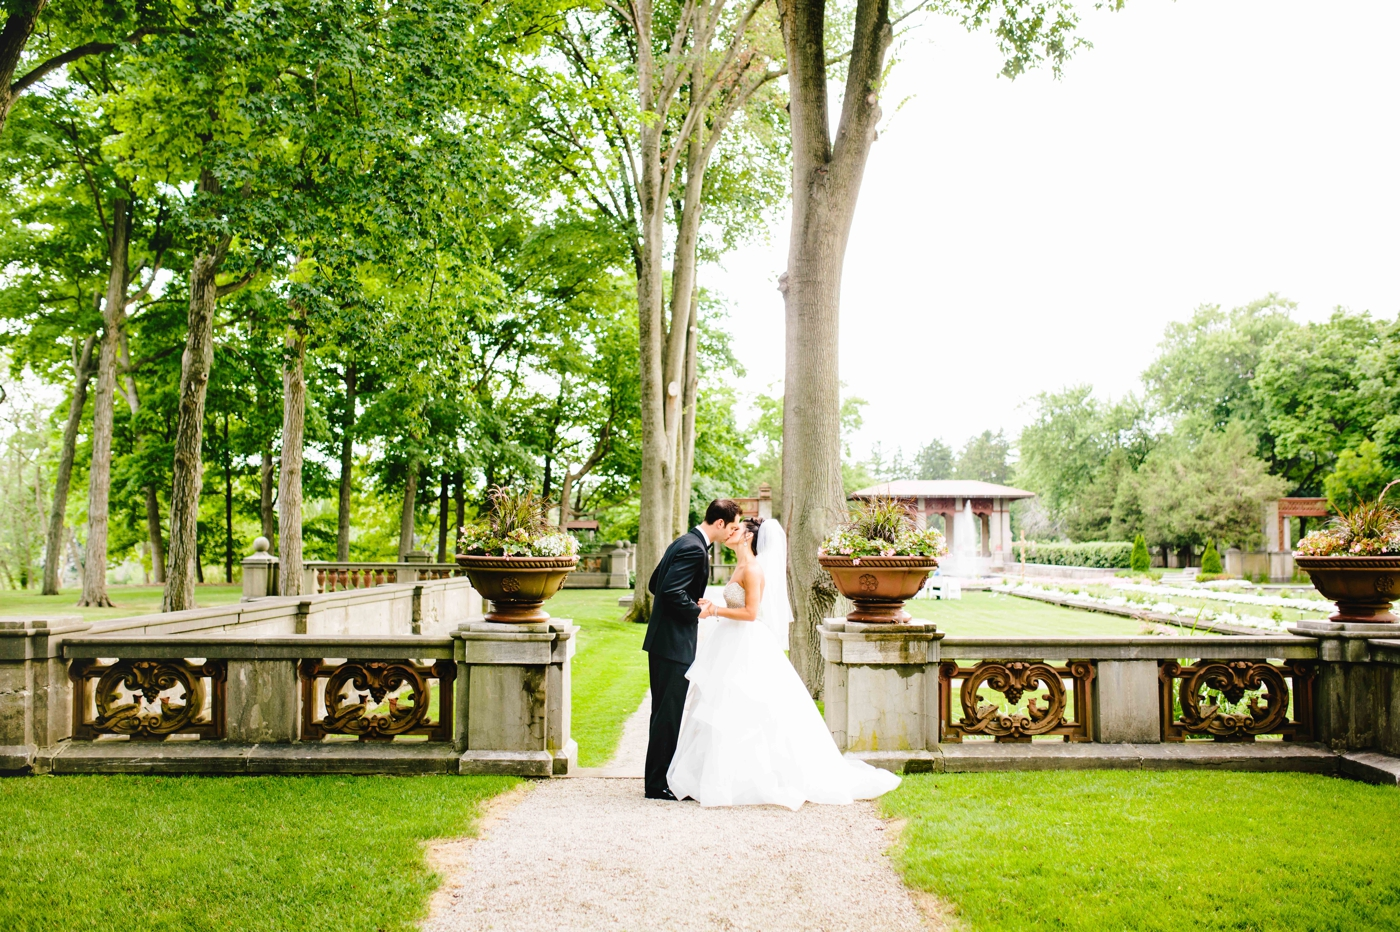 chicago-fine-art-wedding-photography-smeja43